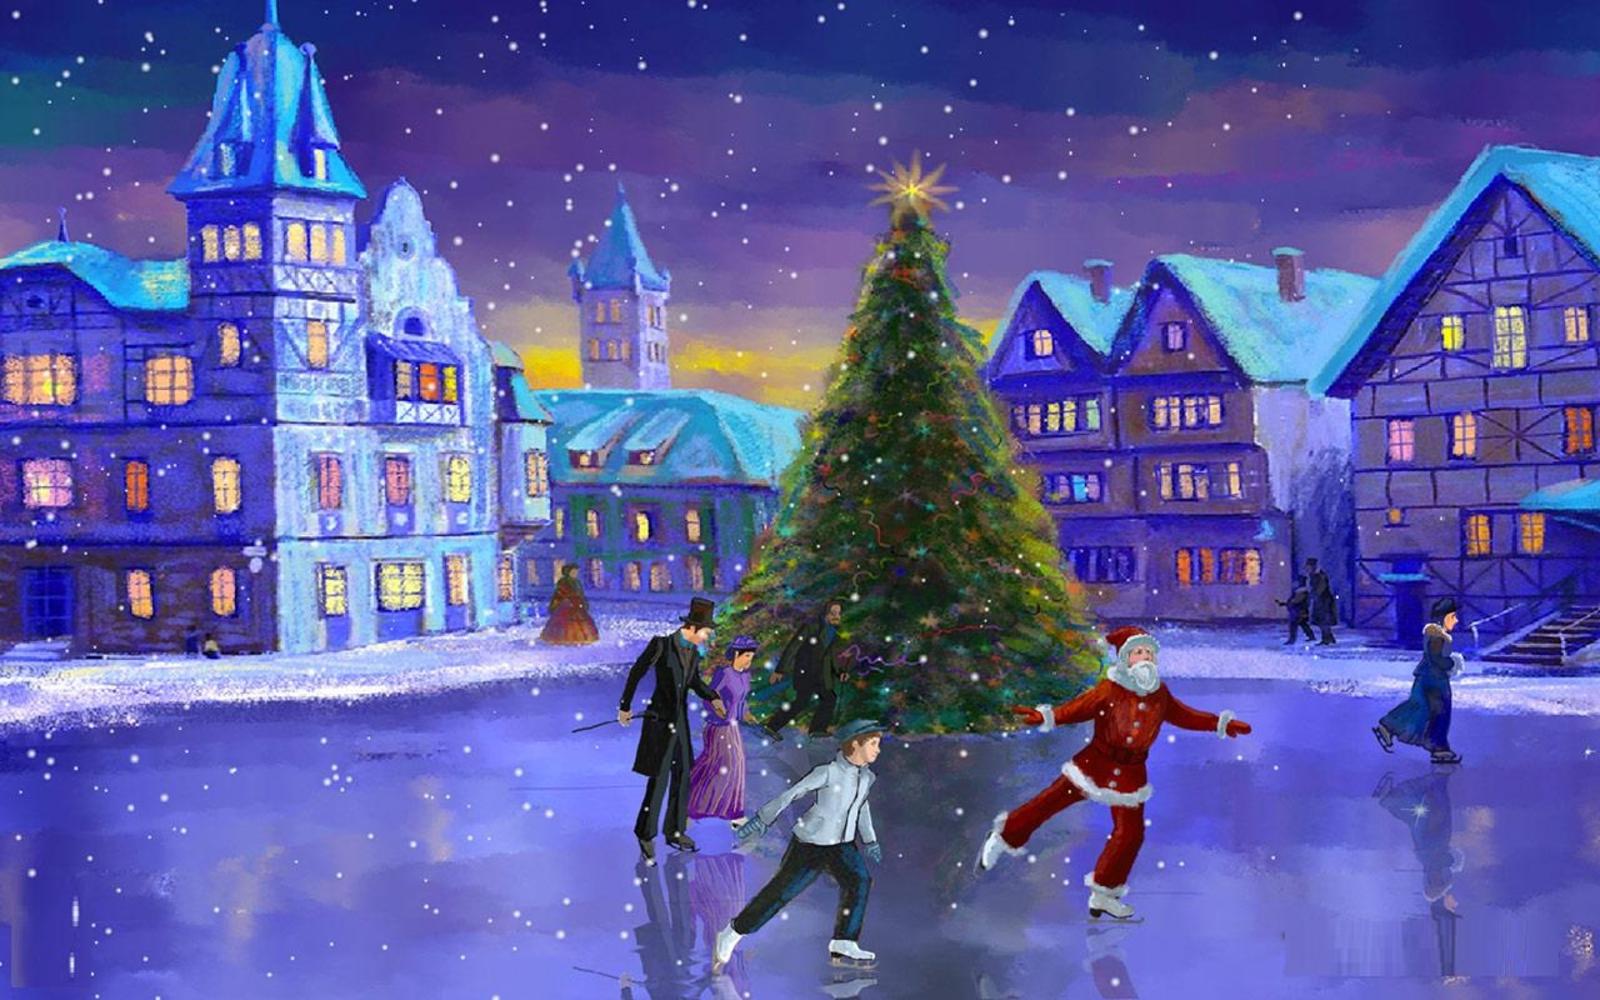 HD Wallpapers Christmas Screensaver for PC desktop 1600x1000